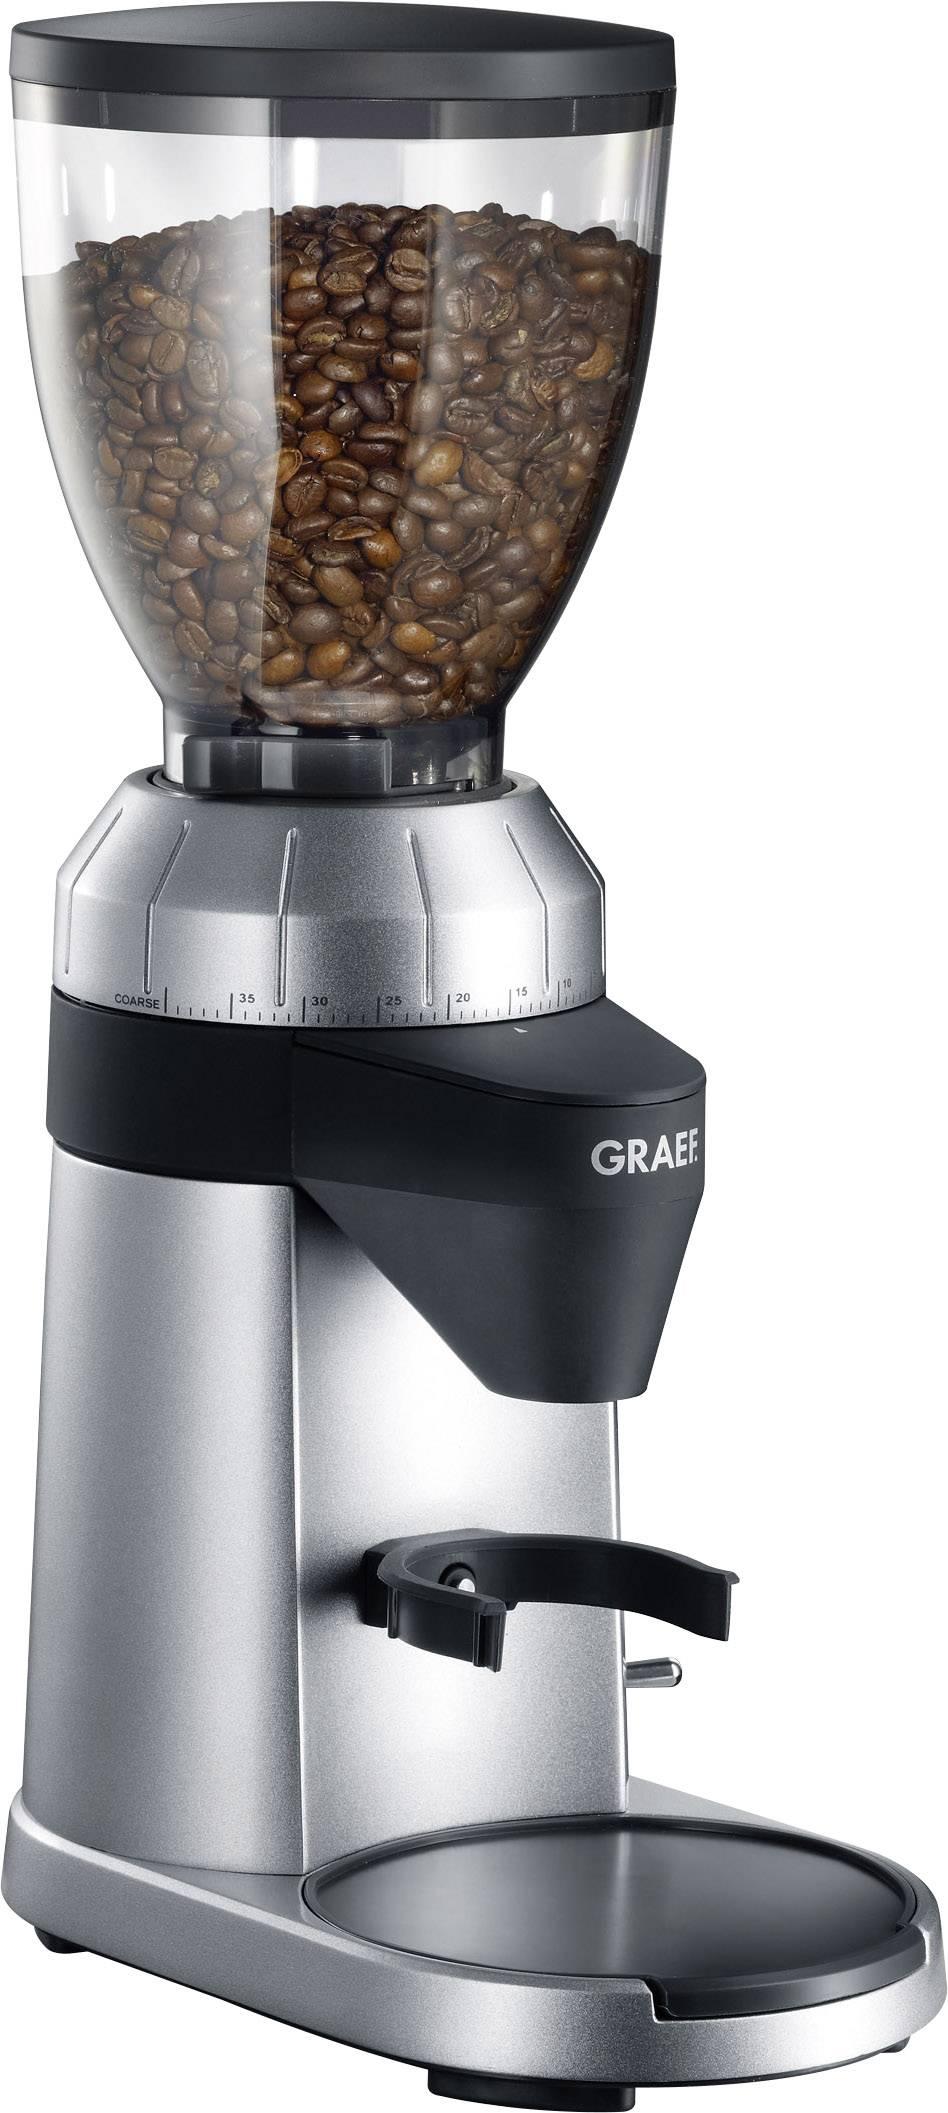 Graef CM800EU CM800EU mlinček za kavo srebrna, črna jekleni stožčasti mlinček